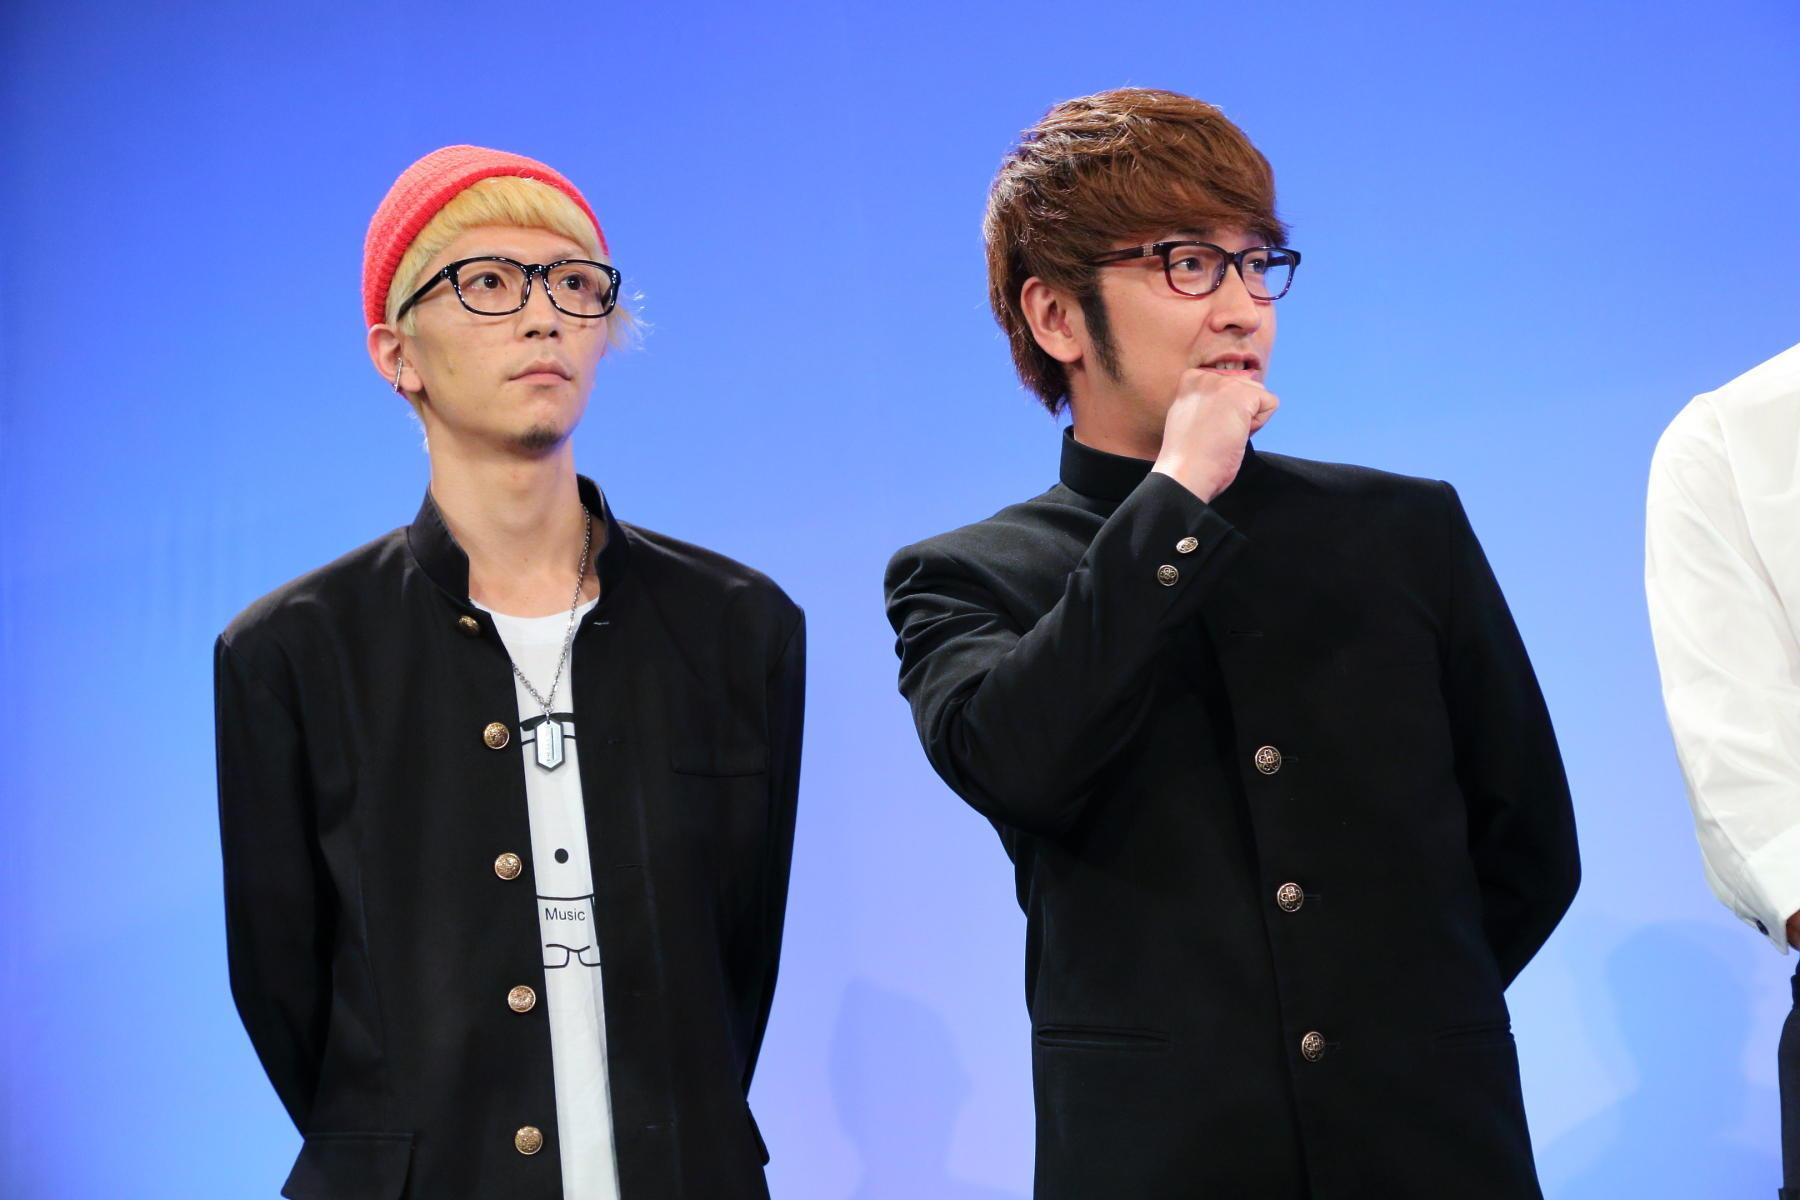 http://news.yoshimoto.co.jp/20170316061816-5bcb746e1a0edd26482af578bebd3f0d7402f205.jpg